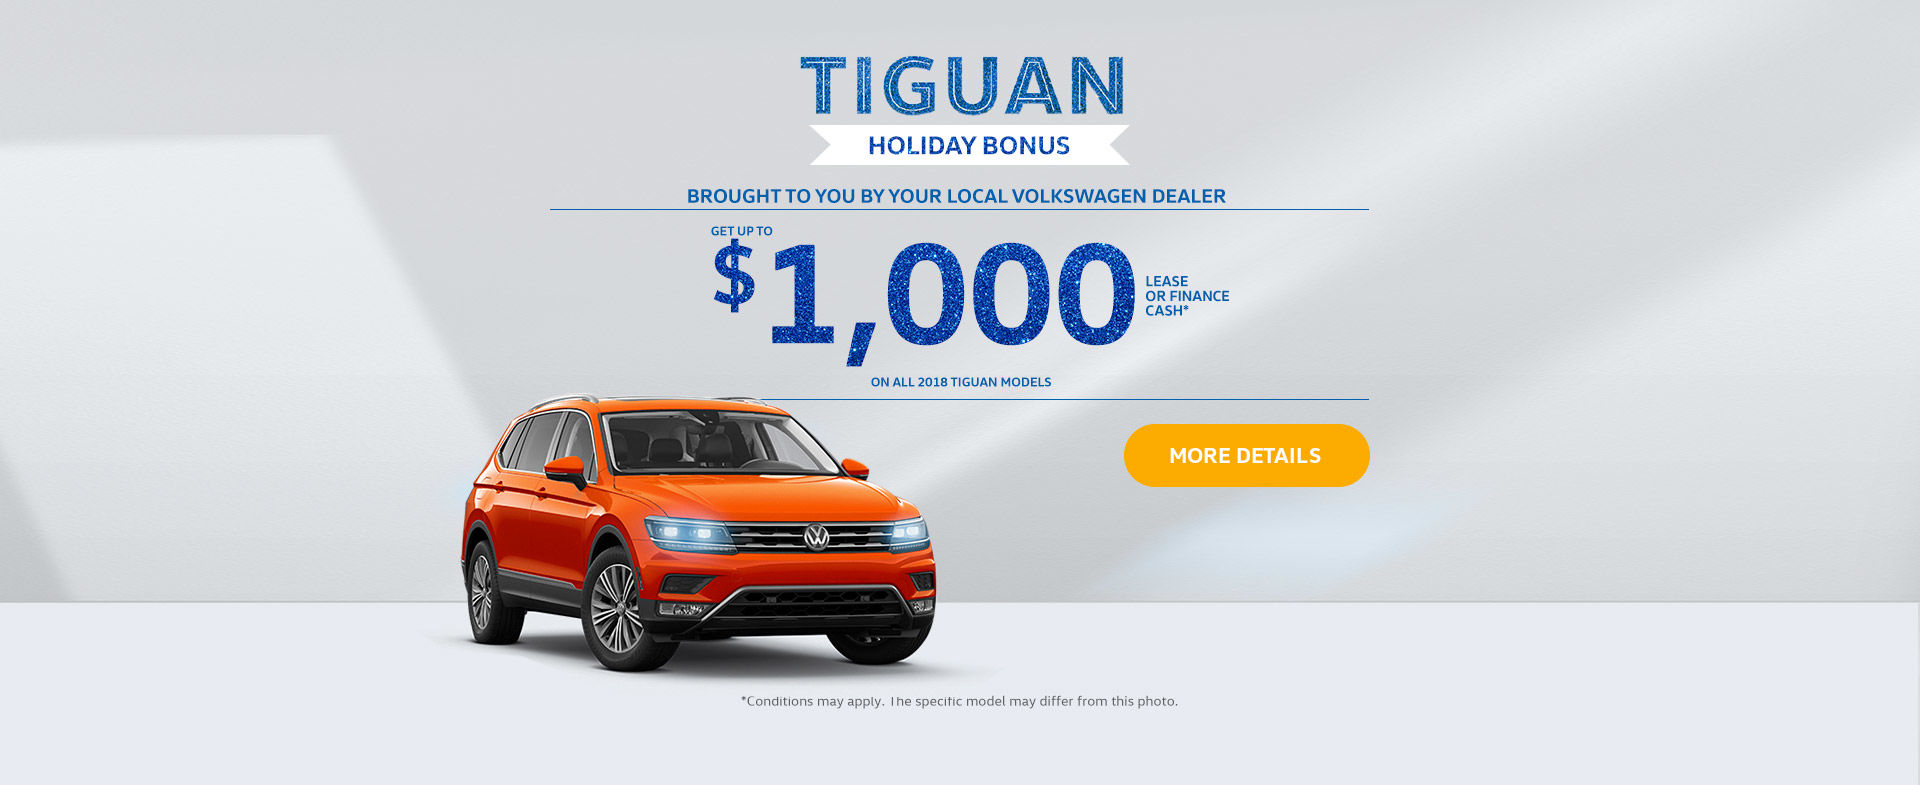 Tiguan Holiday Bonus